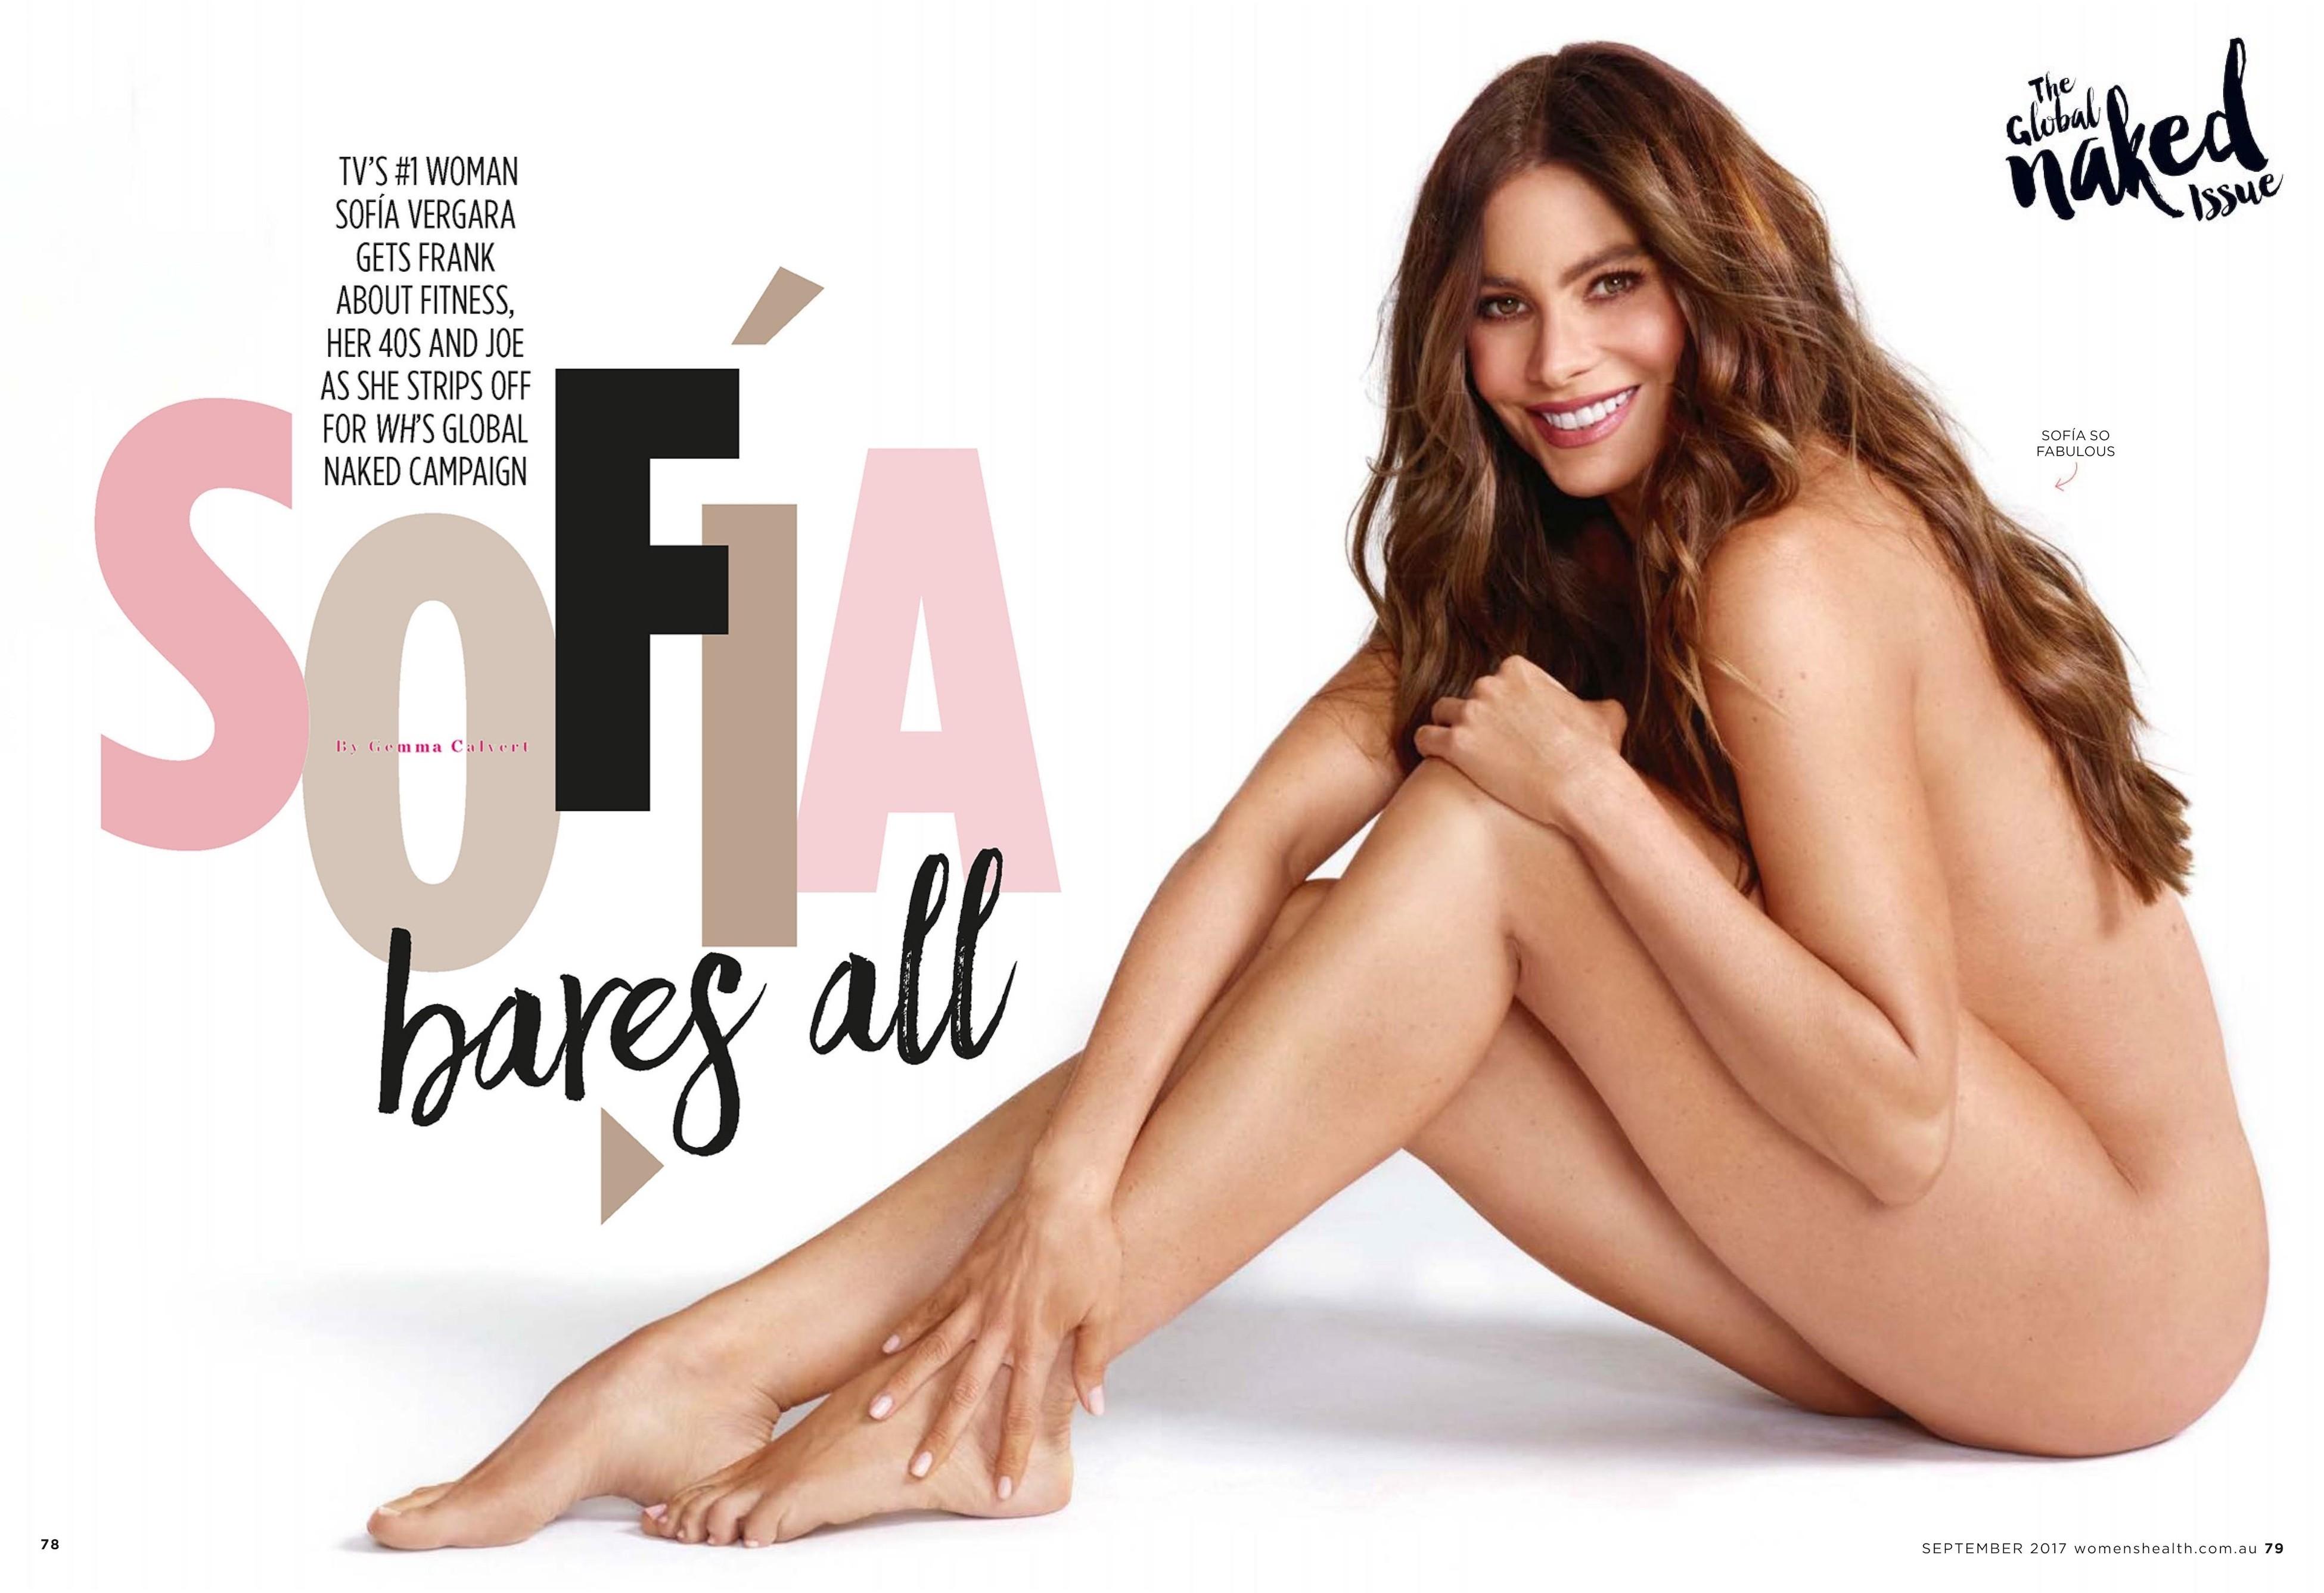 Sofia vergara poses completely nude for women's health, reveals joe manganiello's reaction